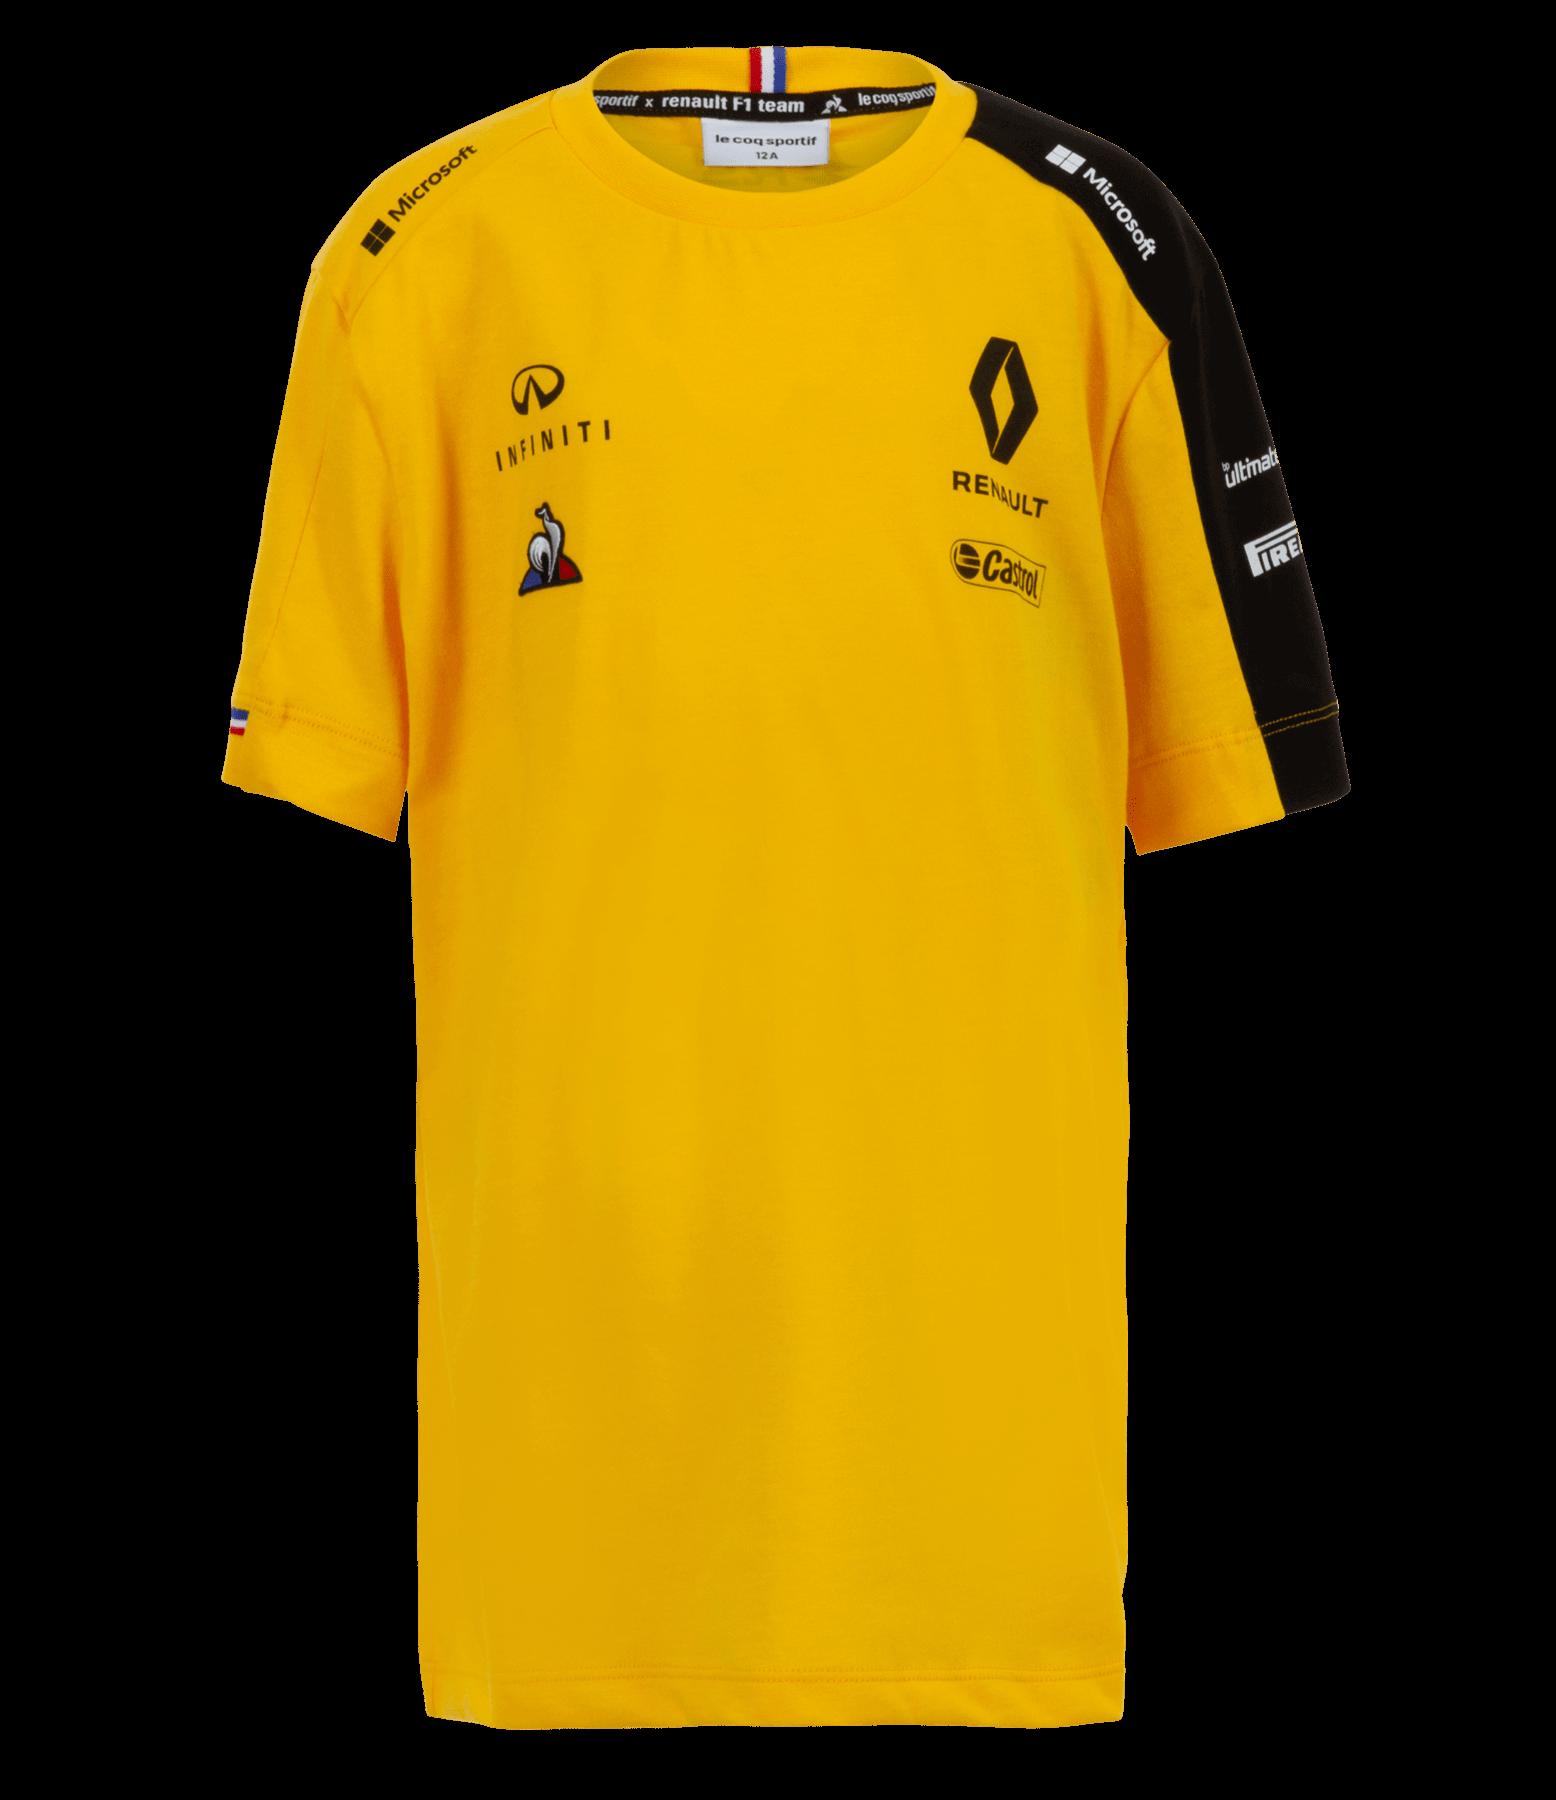 RENAULT F1® TEAM 2019 kid's t-shirt - yellow